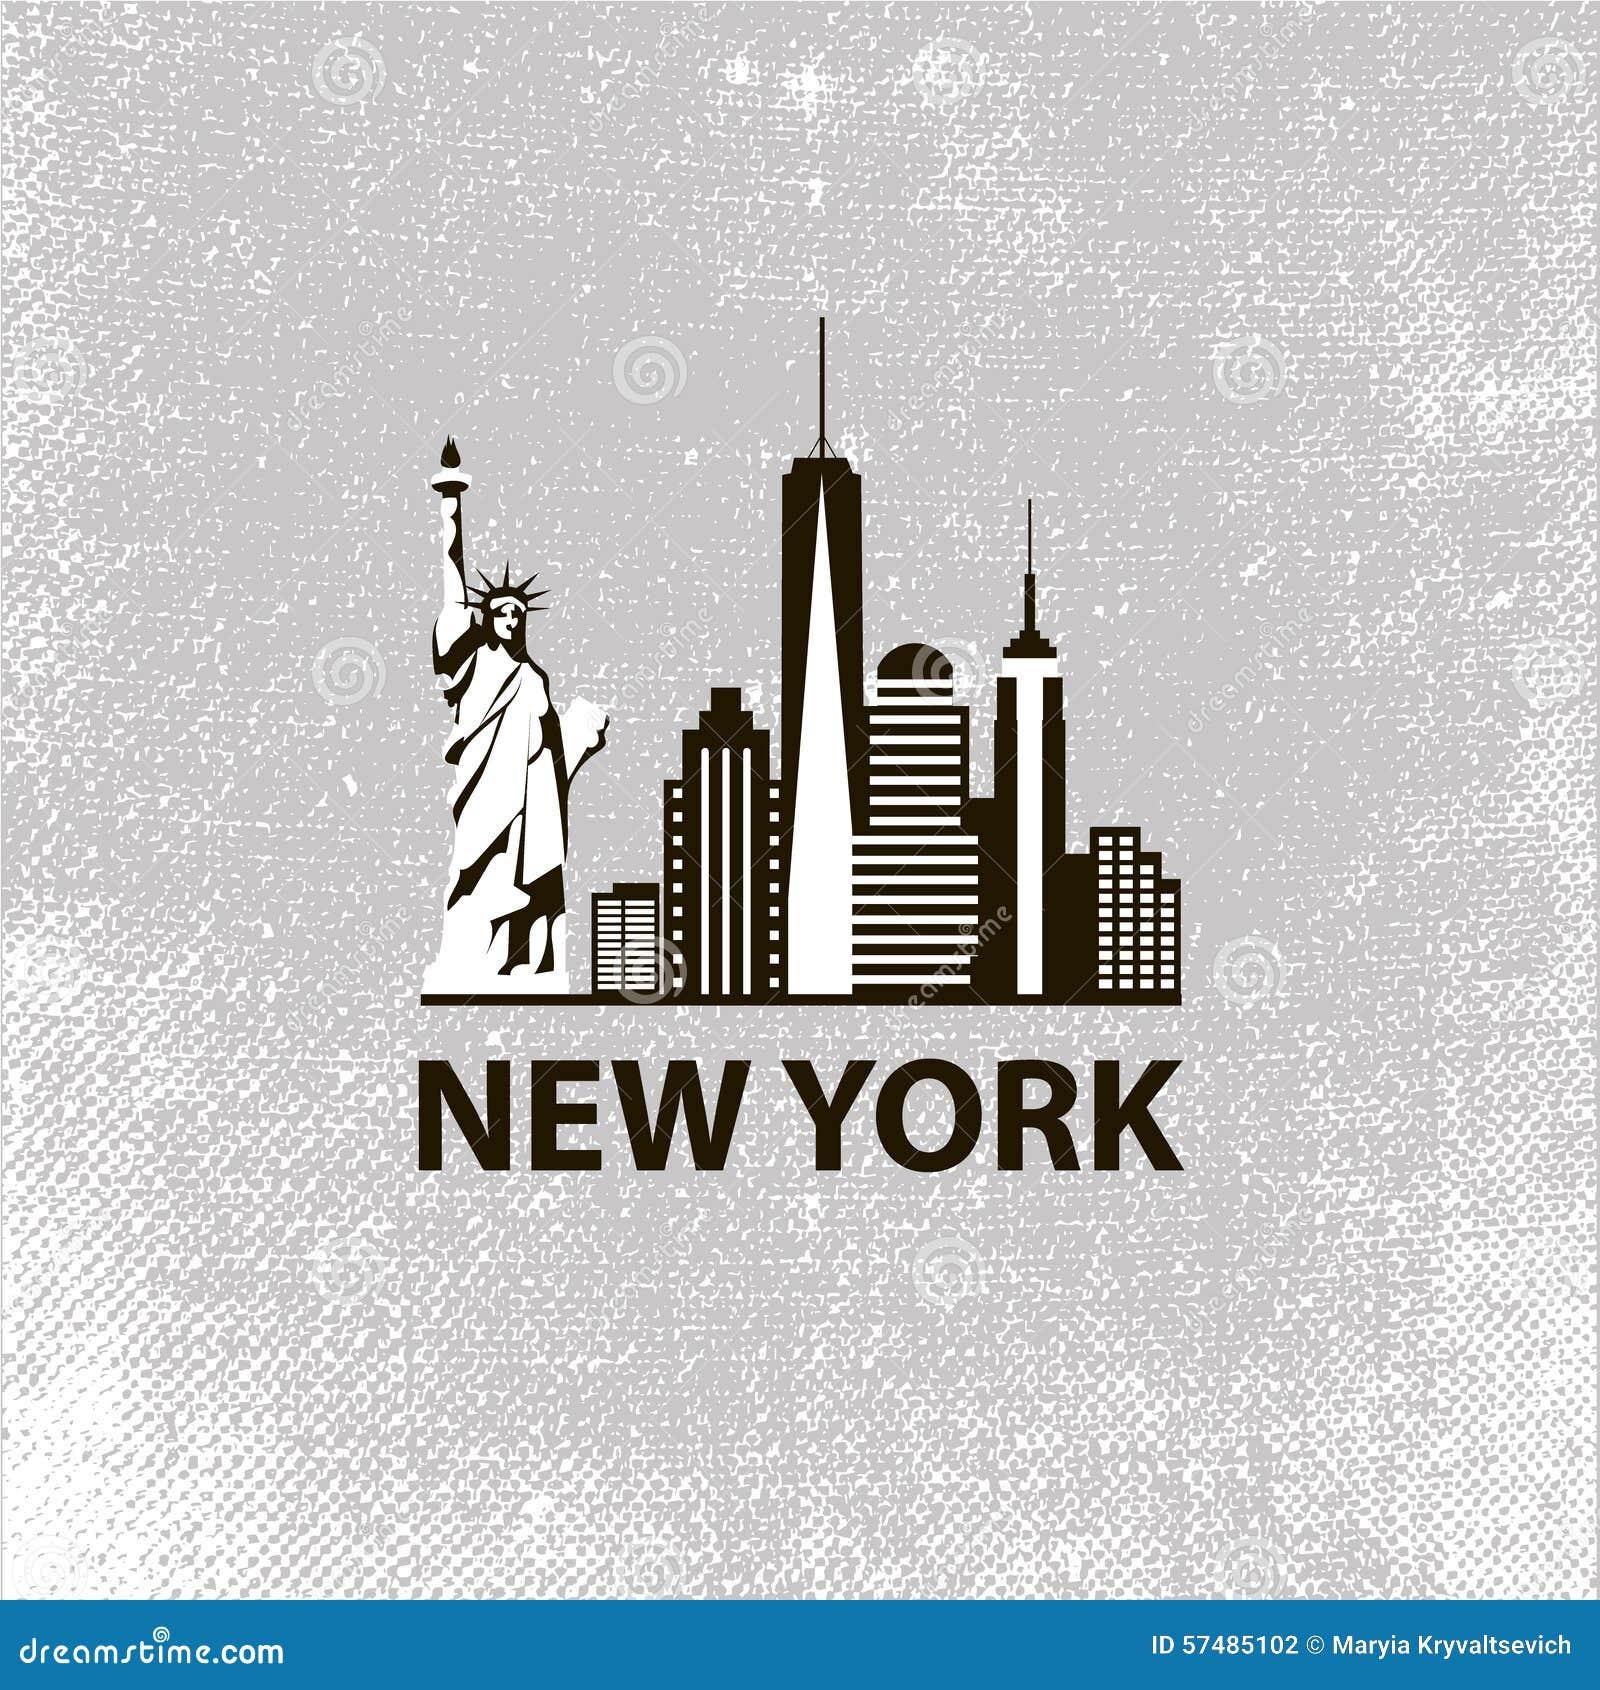 new york city architecture retro black and white stock new york city victory parade of 1946 new york city vector free